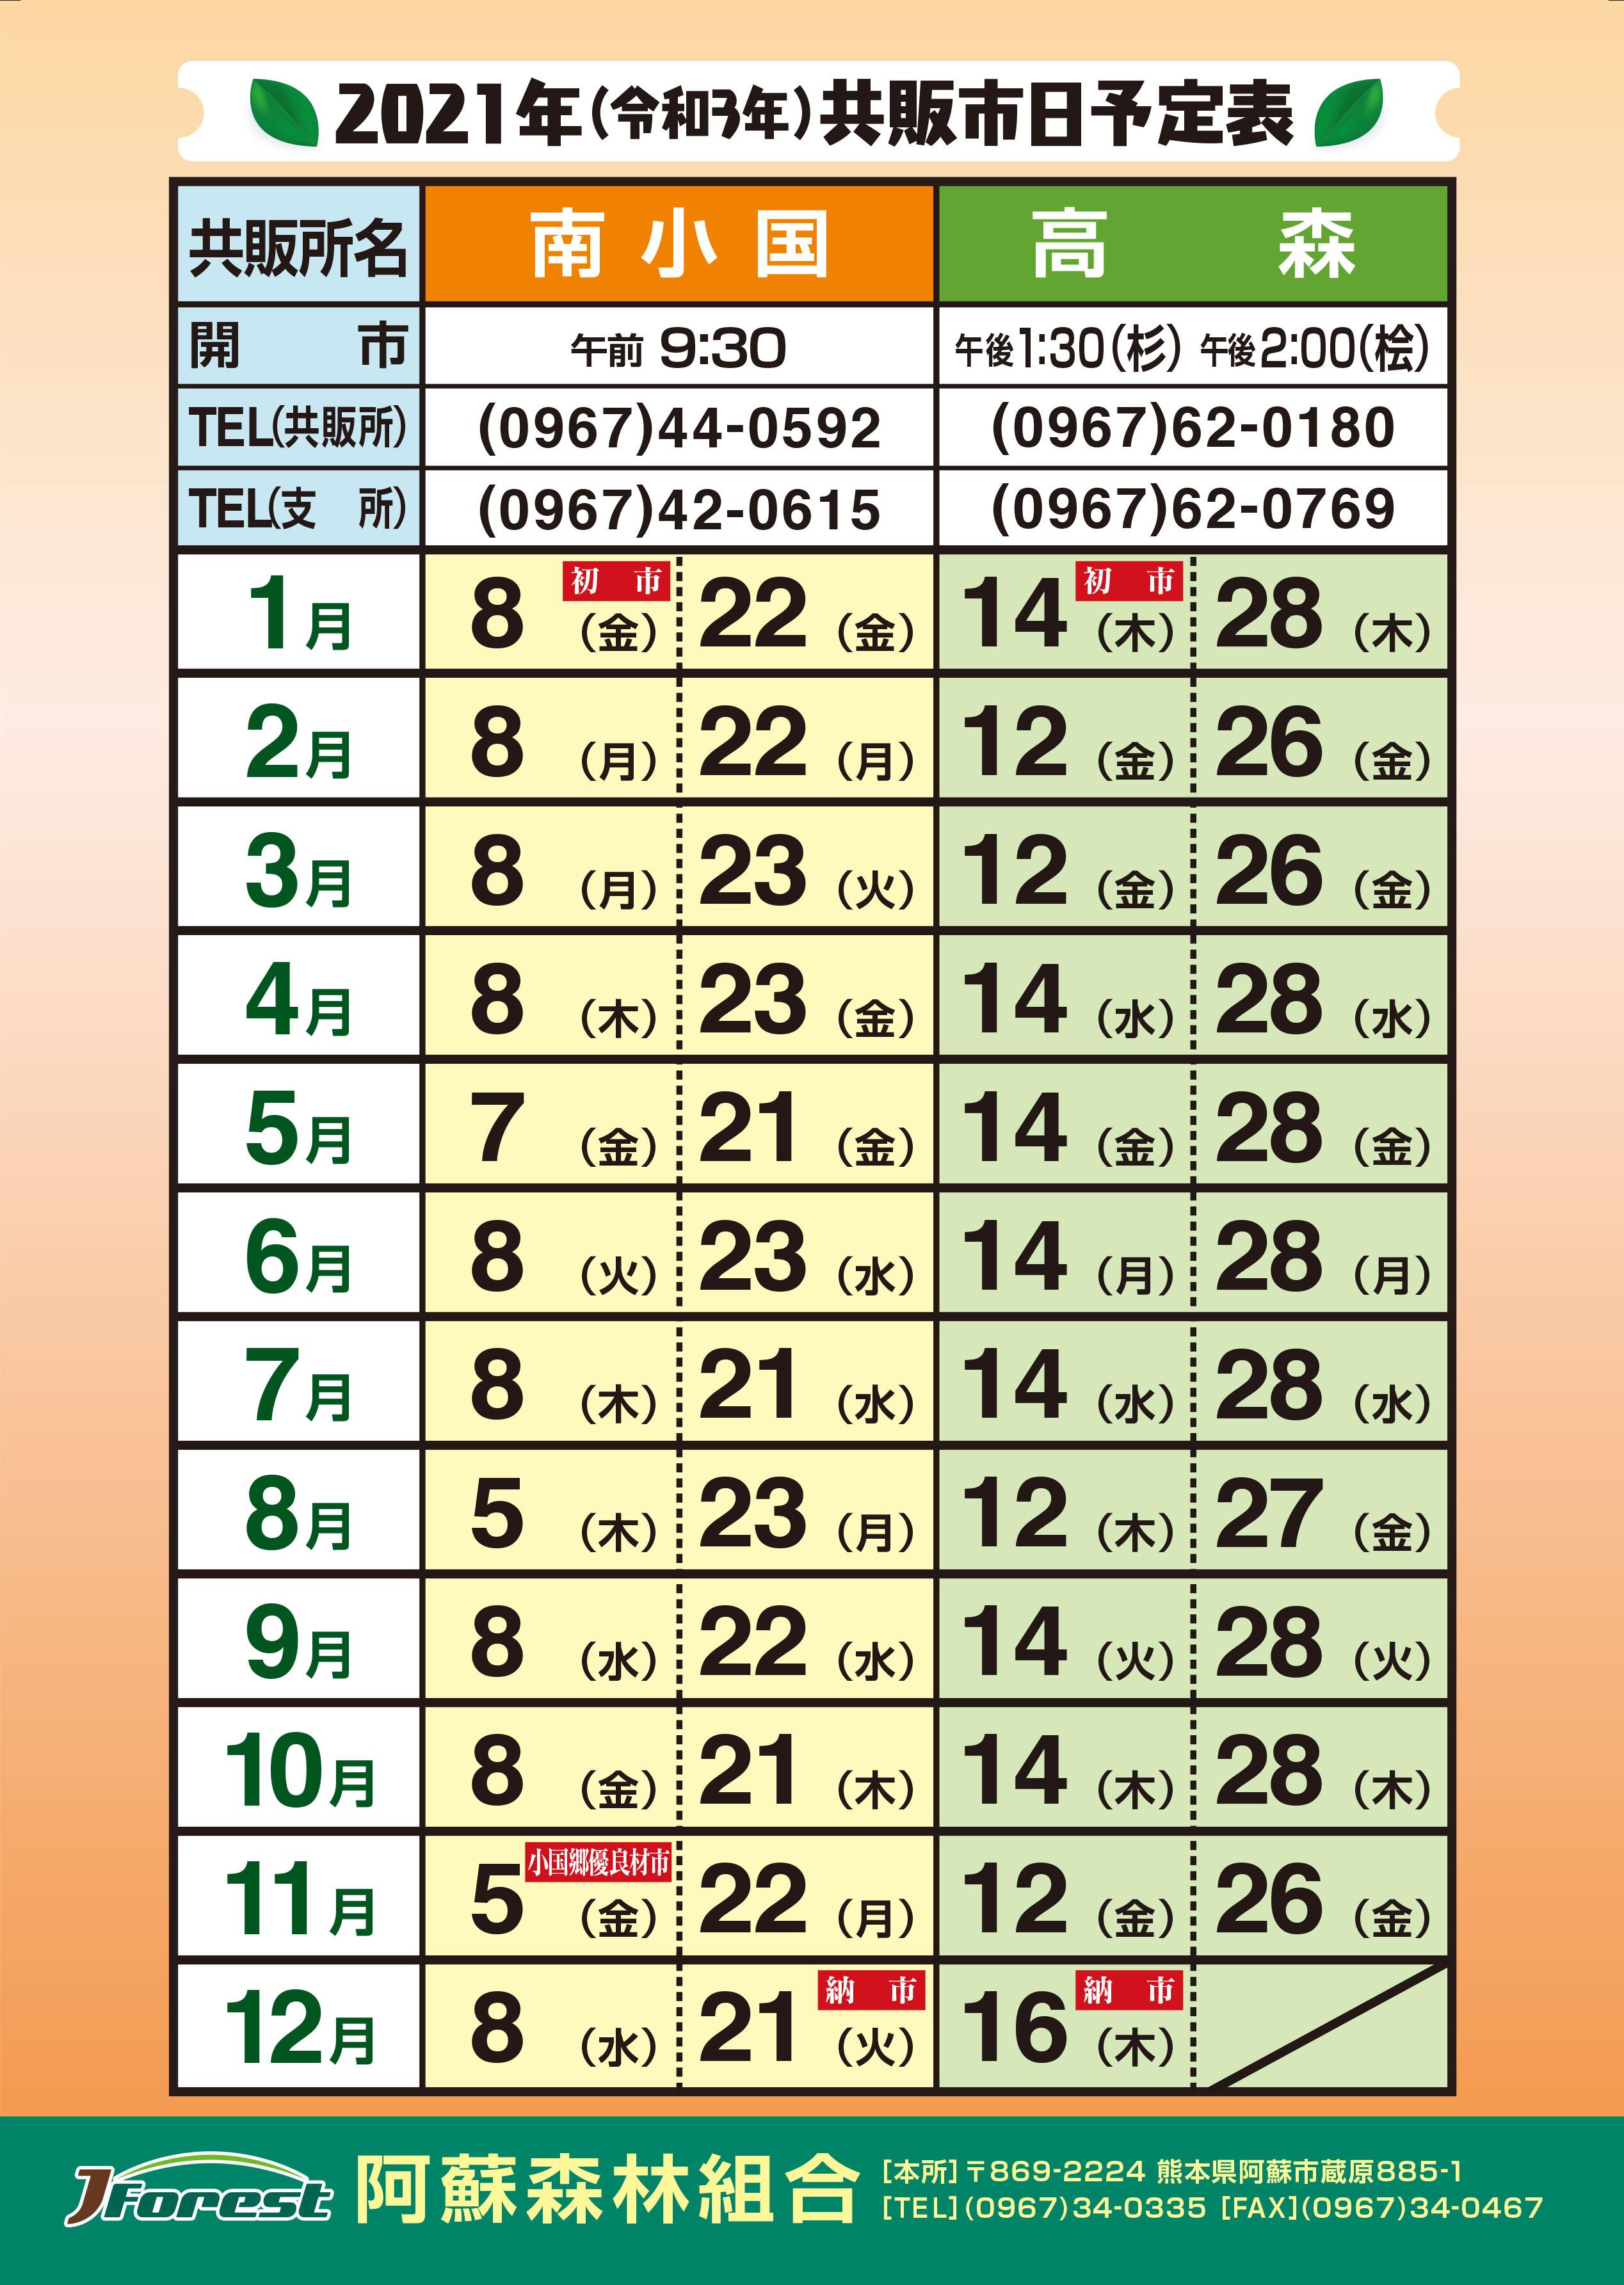 令和3年共販市日予定表